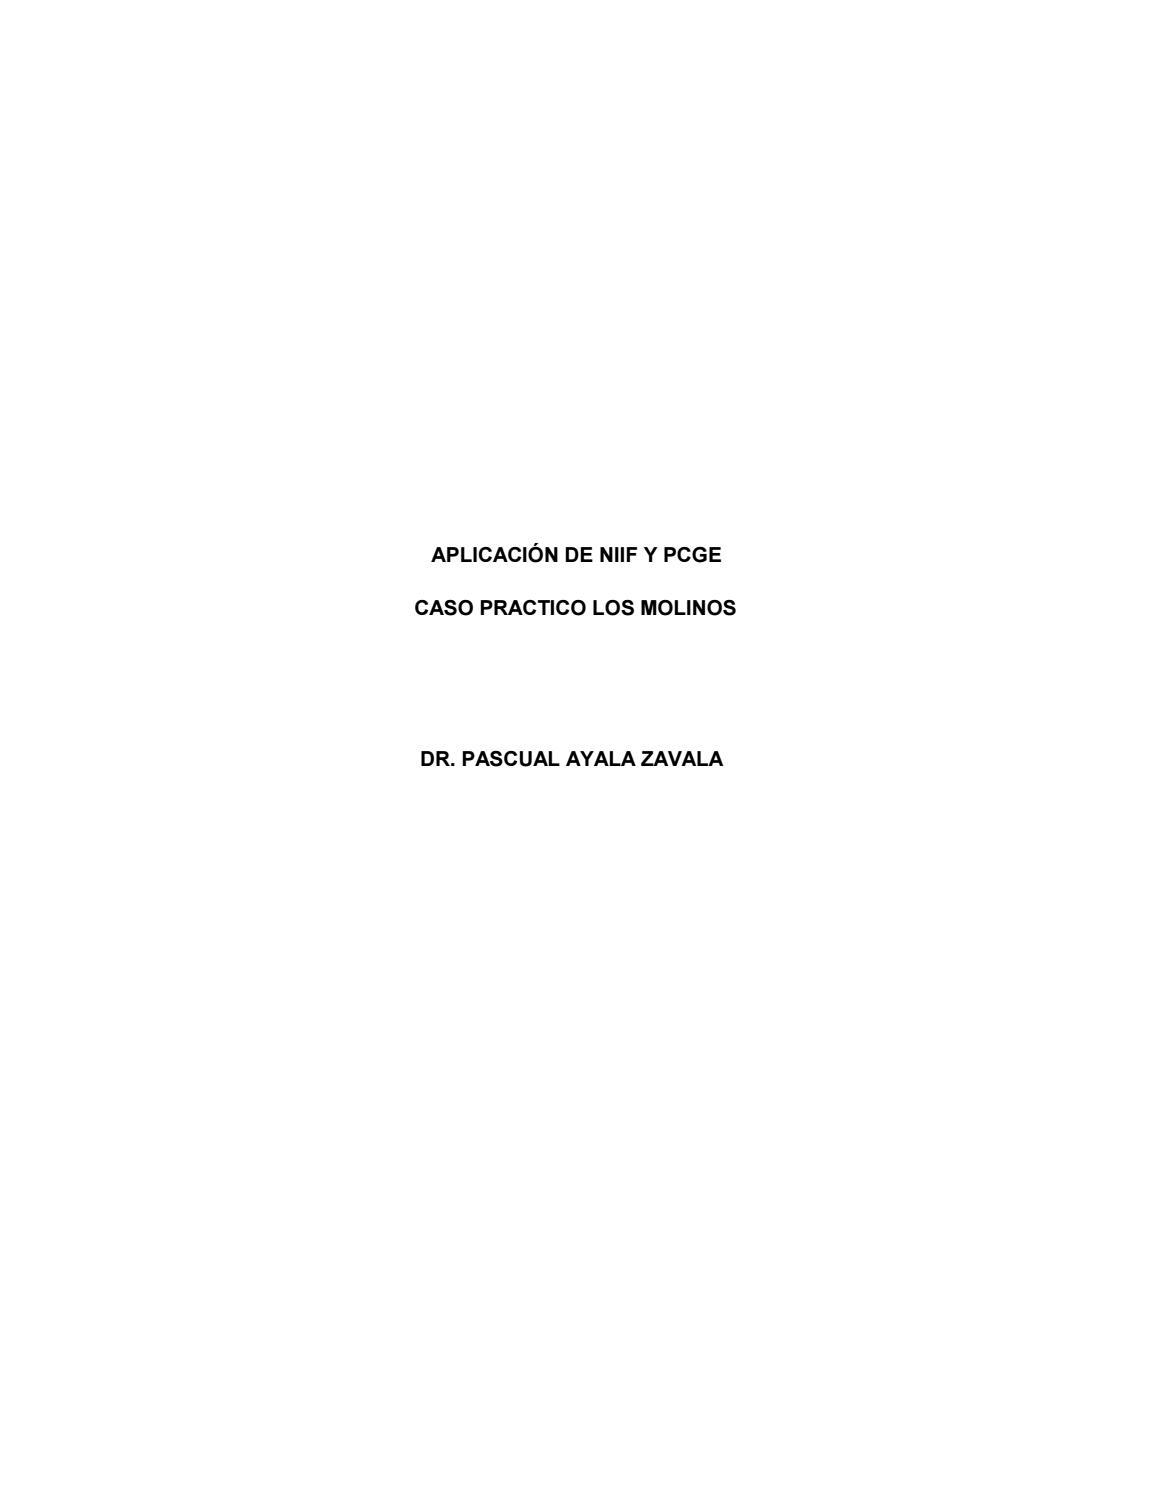 CASO PRACTICO EMPRESA COMERCIAL NIIF PCGE by Pascual Ayala - issuu